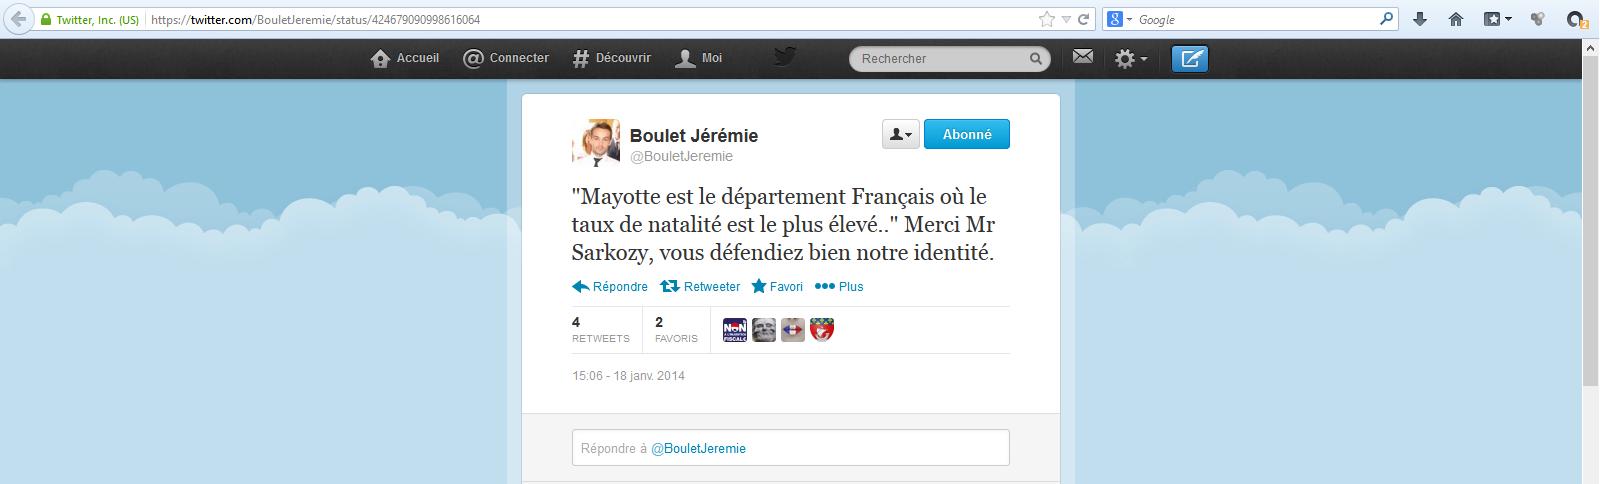 Jeremie-Boulet-18-01-14-Mayotte